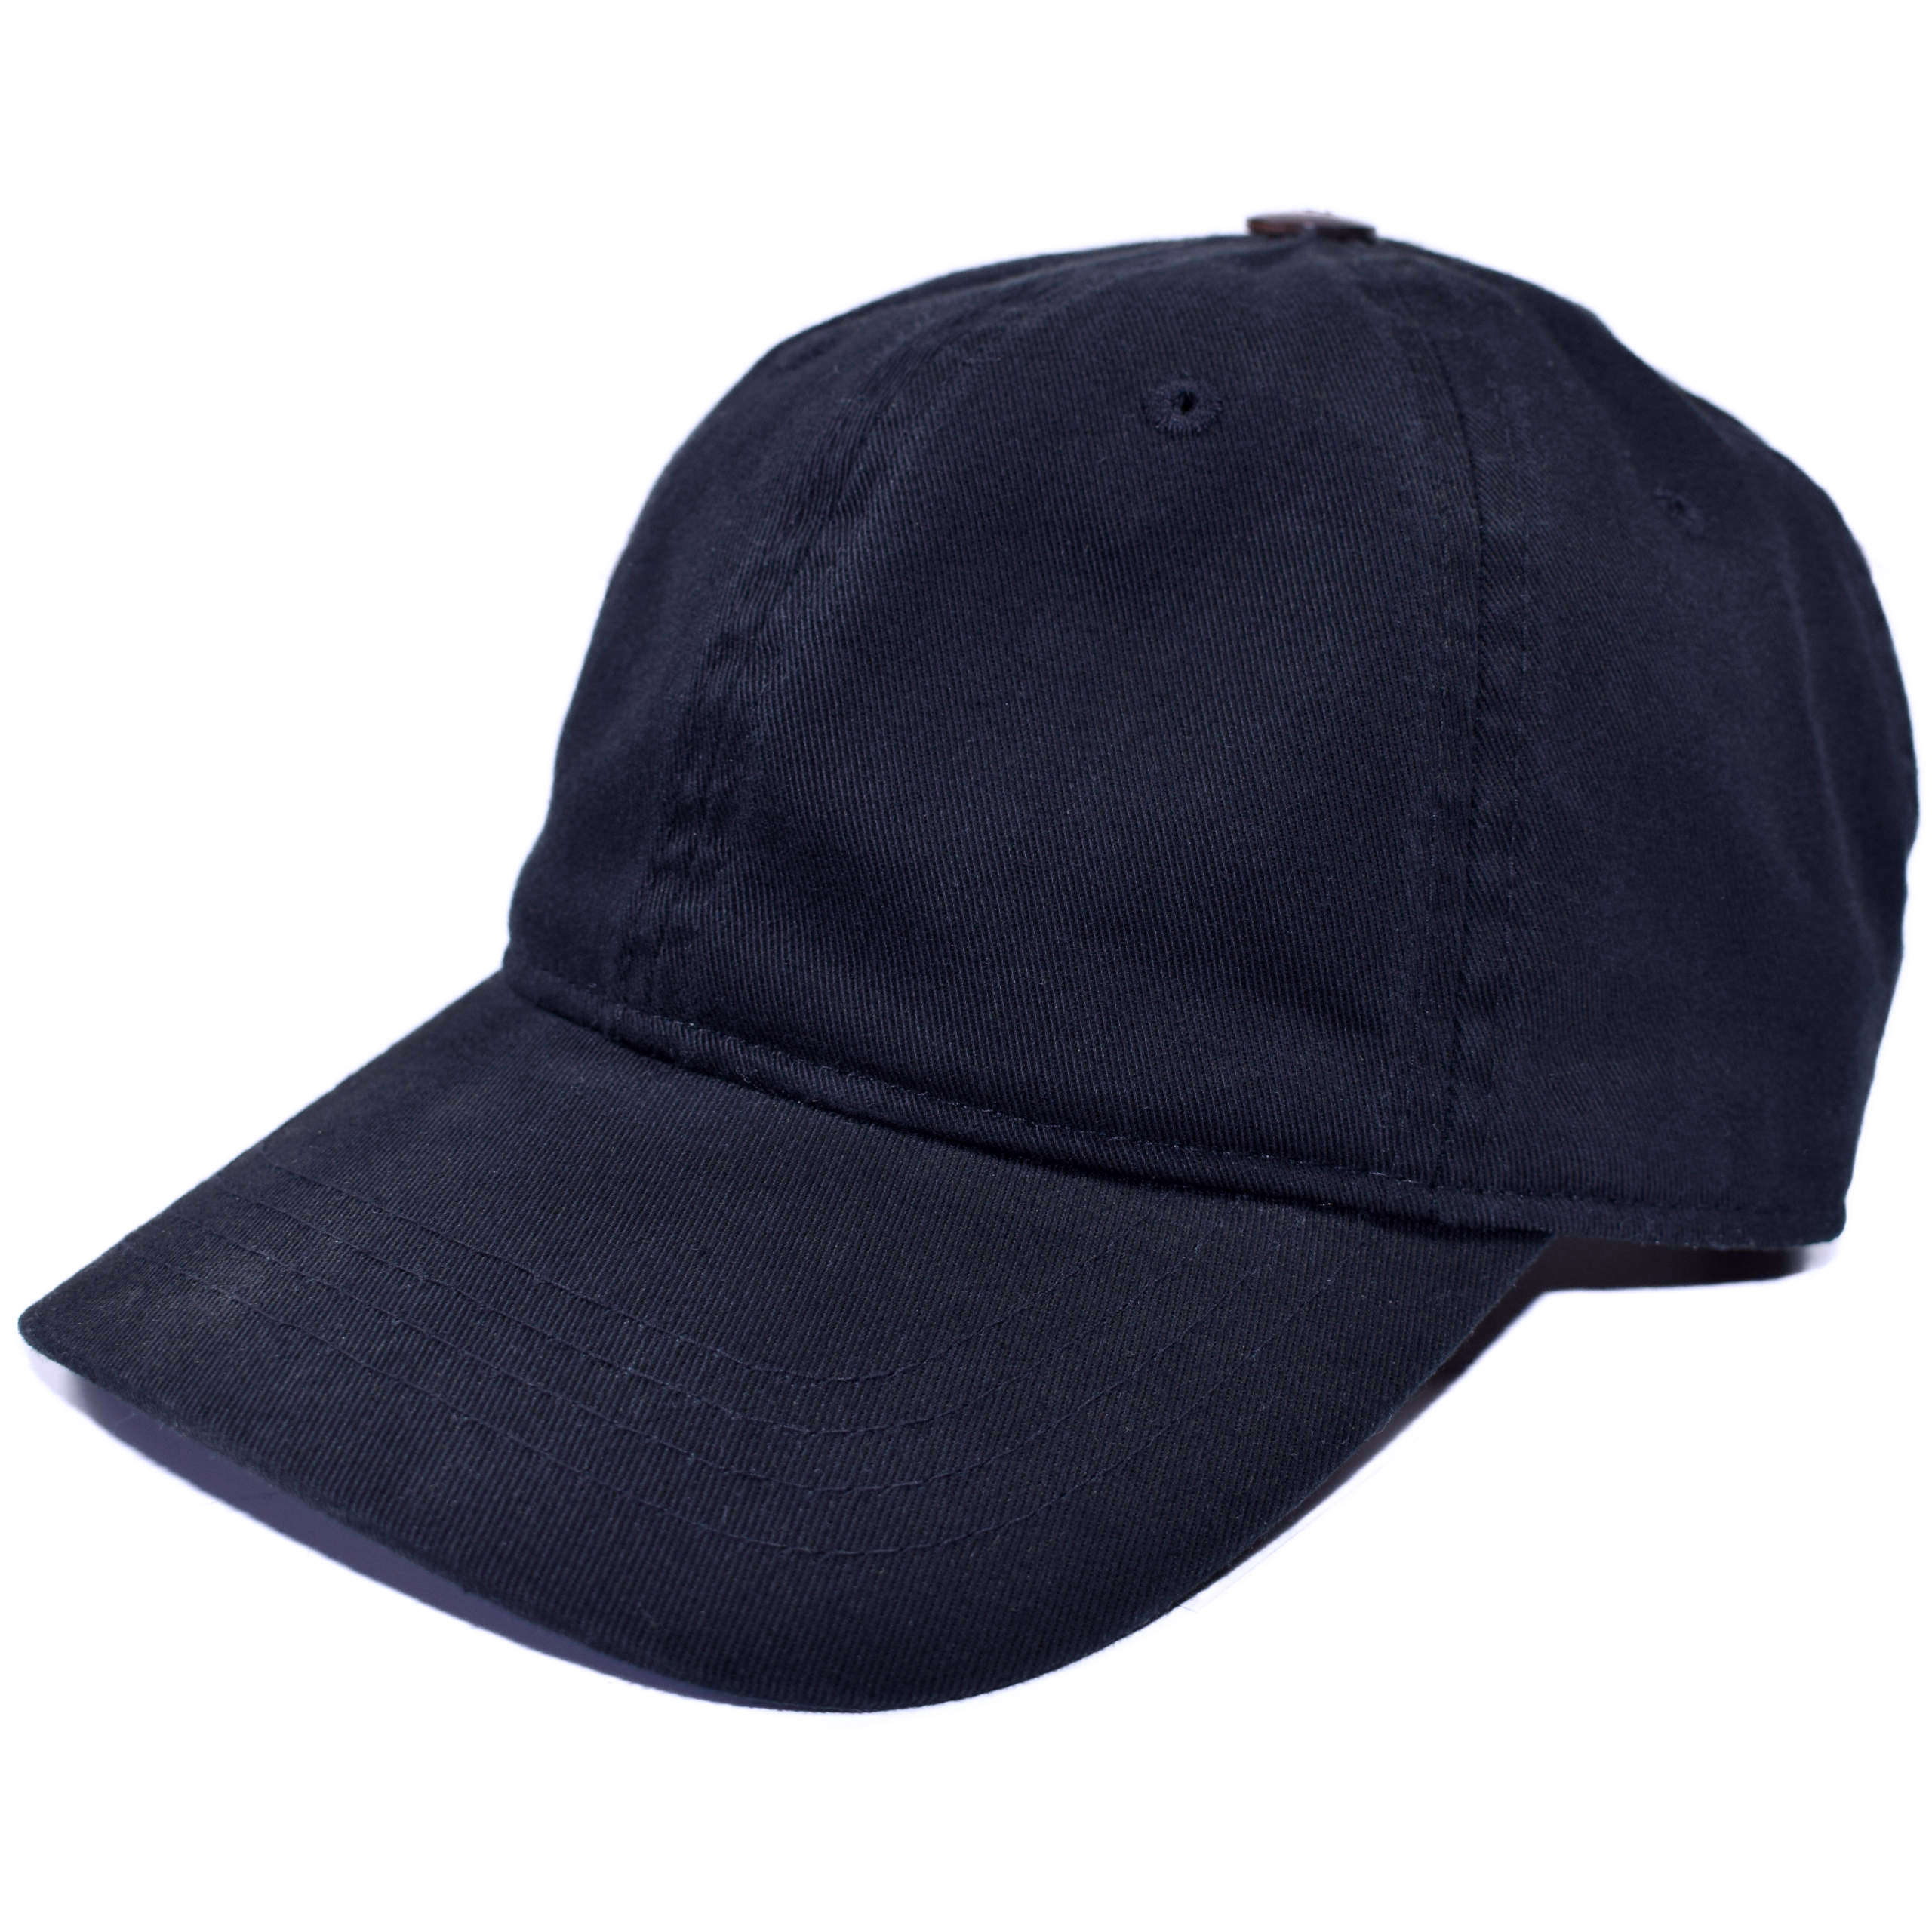 cap-blau-bio-baumwolle-made-in-europe-snapback-dad-cappy-lou-irnpE8WUbx5aNi